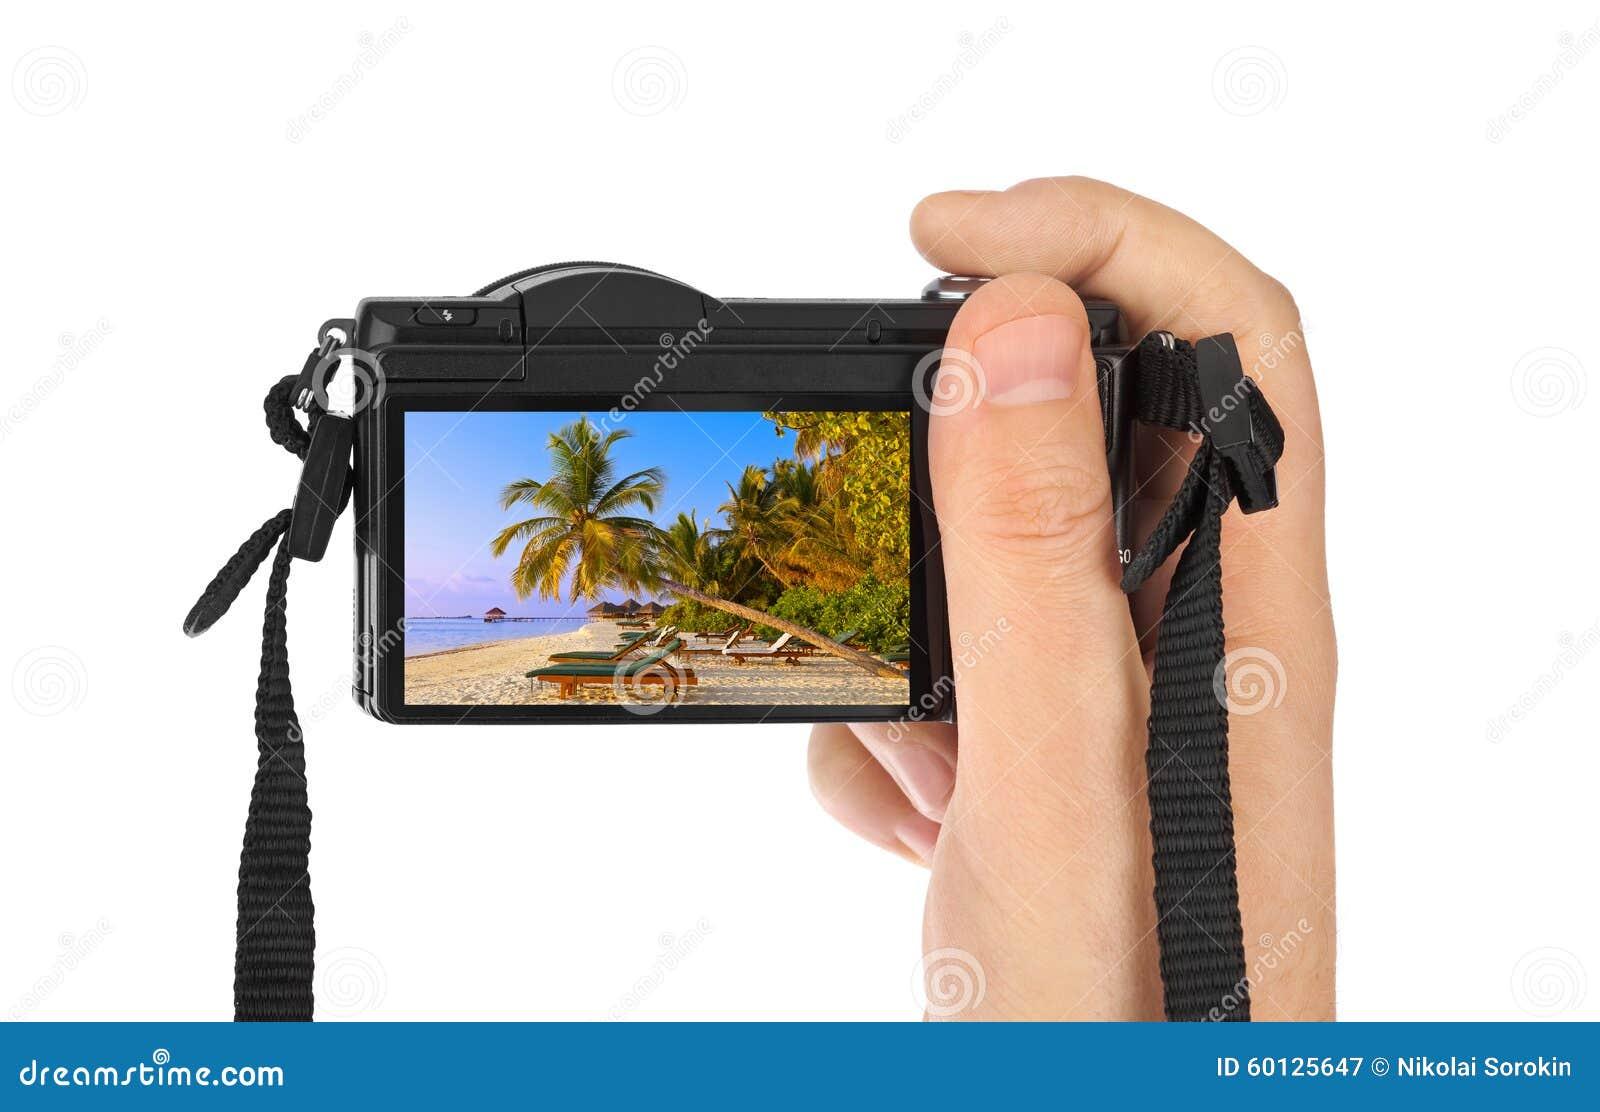 Hand with camera and Maldives beach photo (my photo)